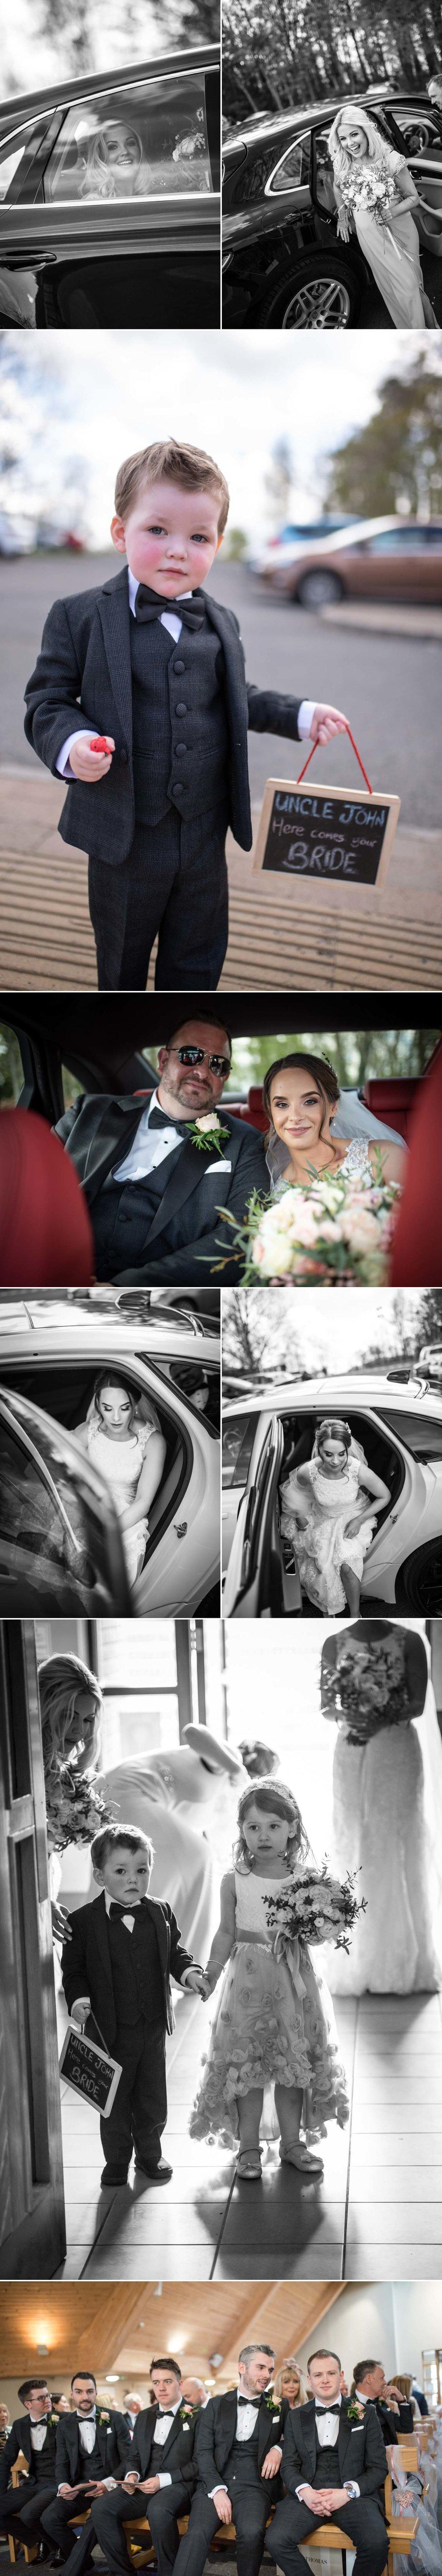 Merchant Hotel Belfast Wedding Photography James McGrillis 08.jpg